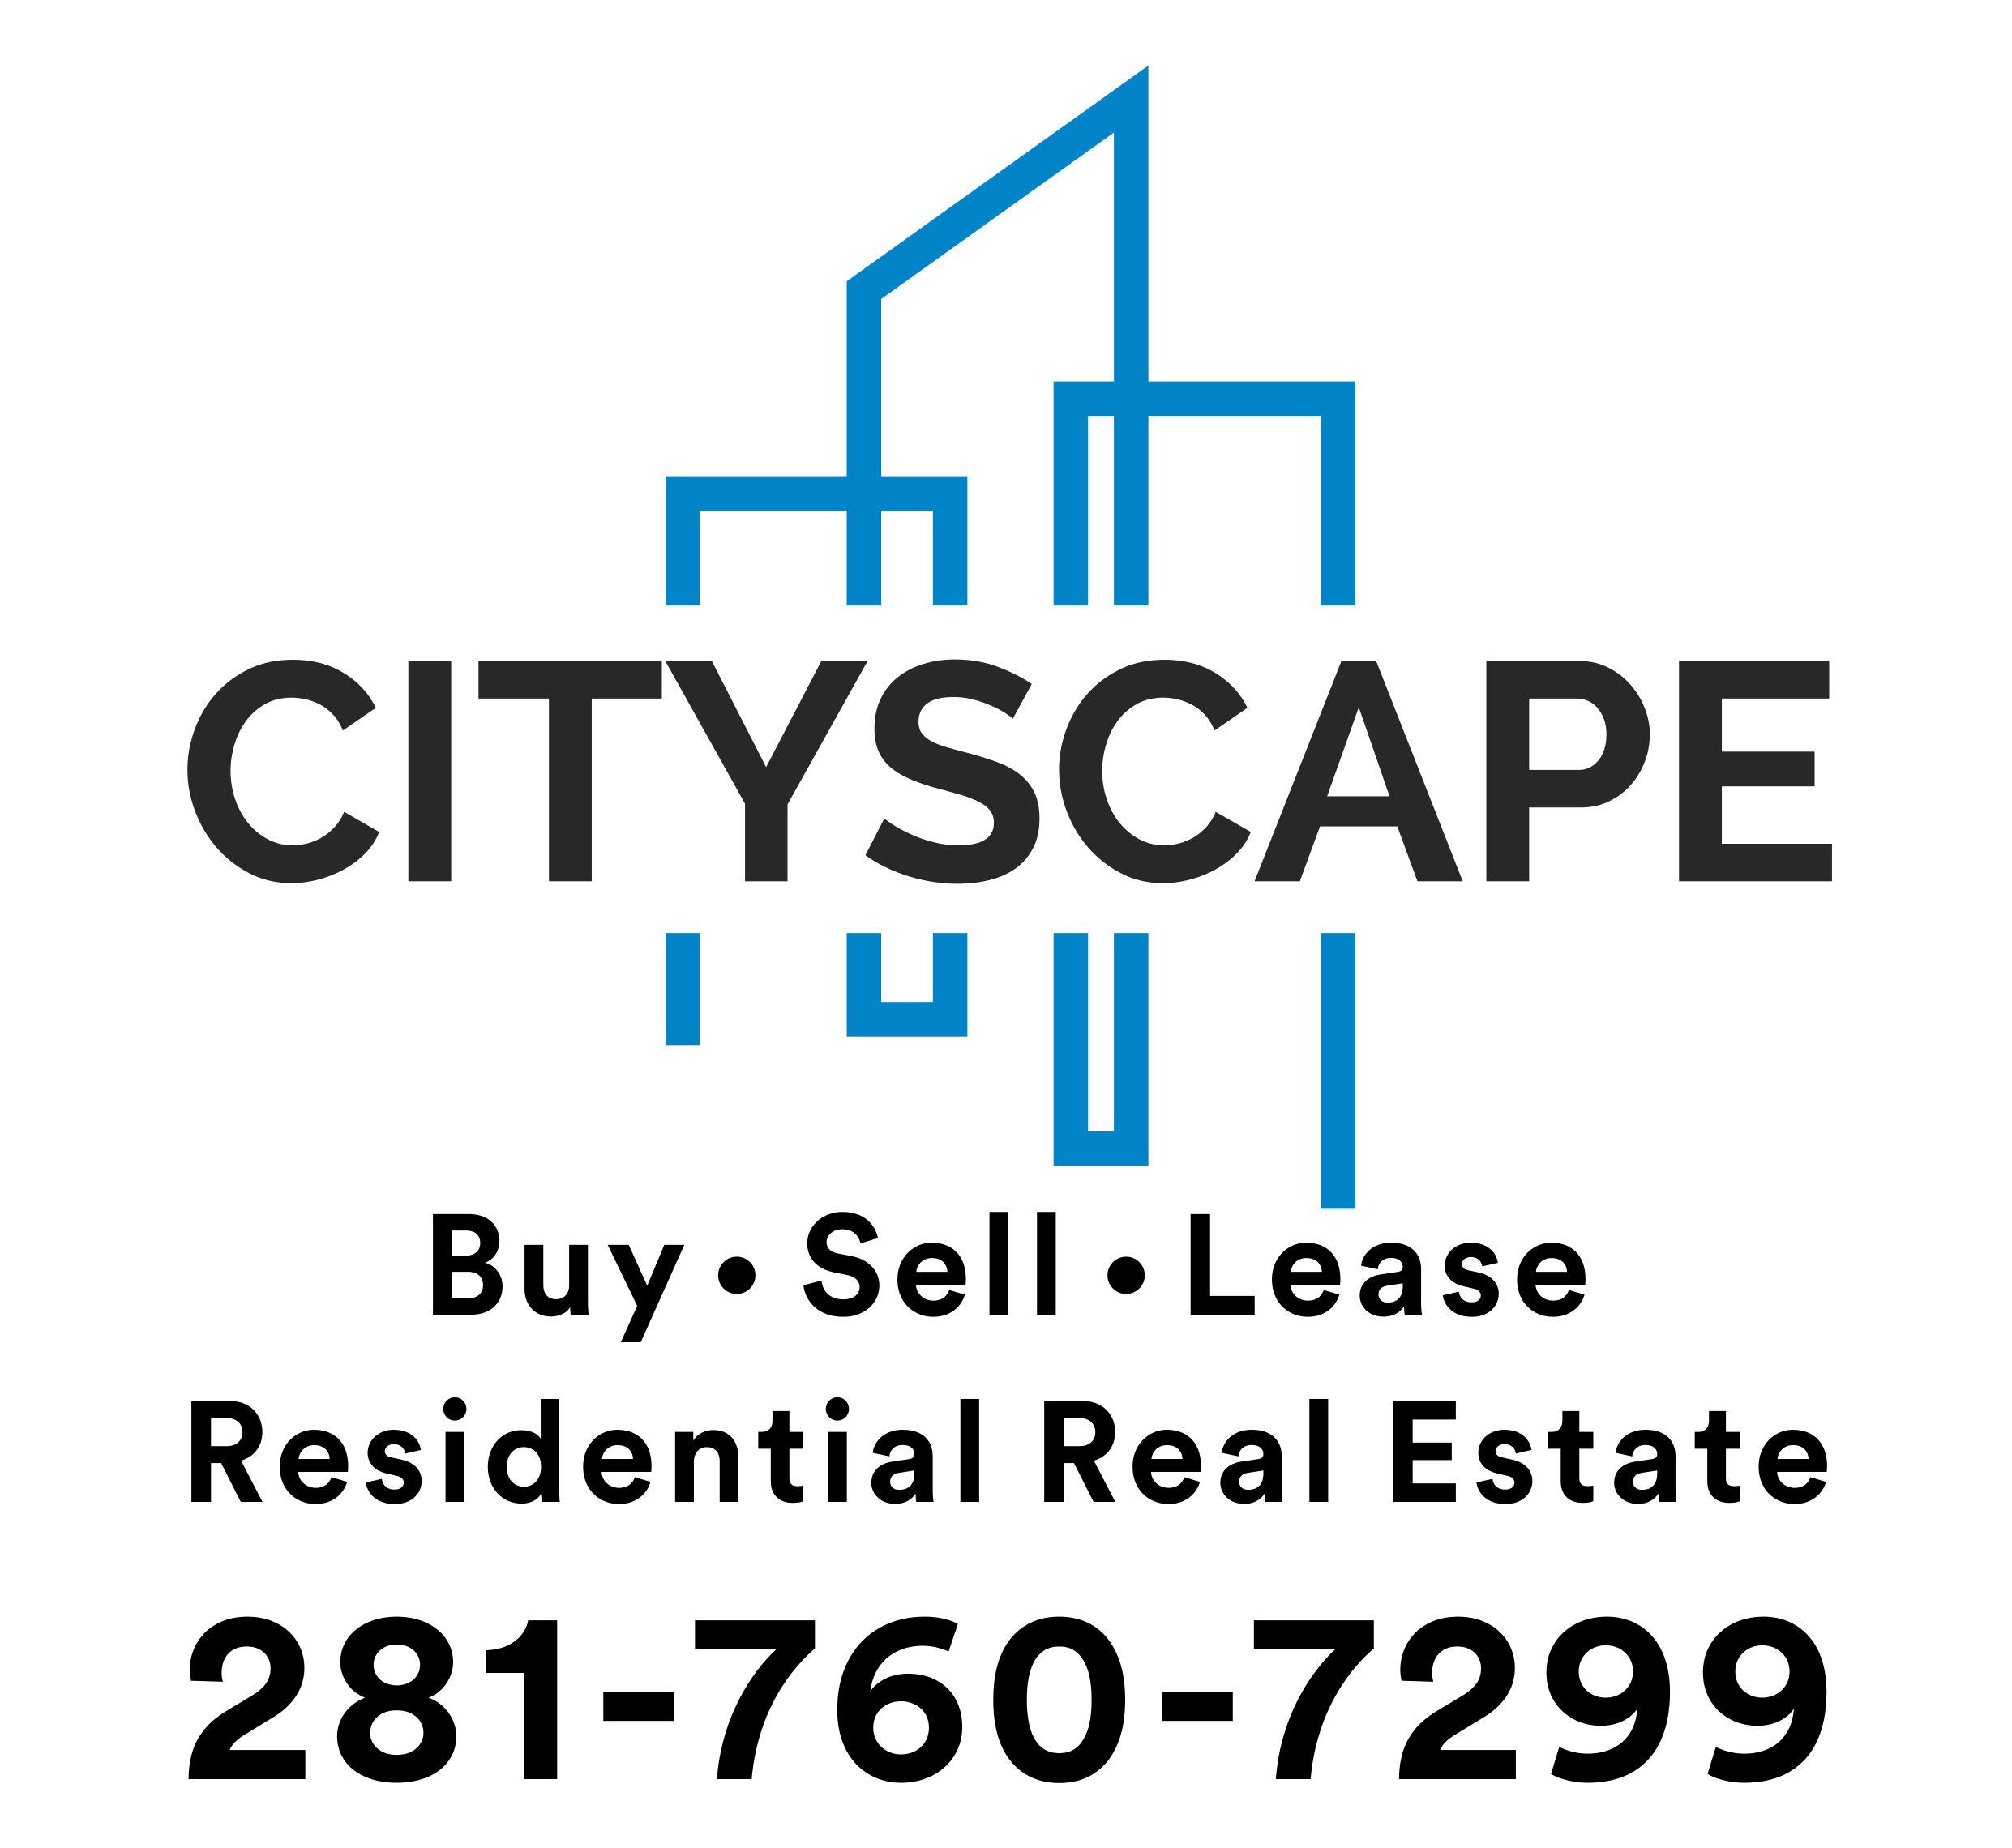 Cityscape Brokers